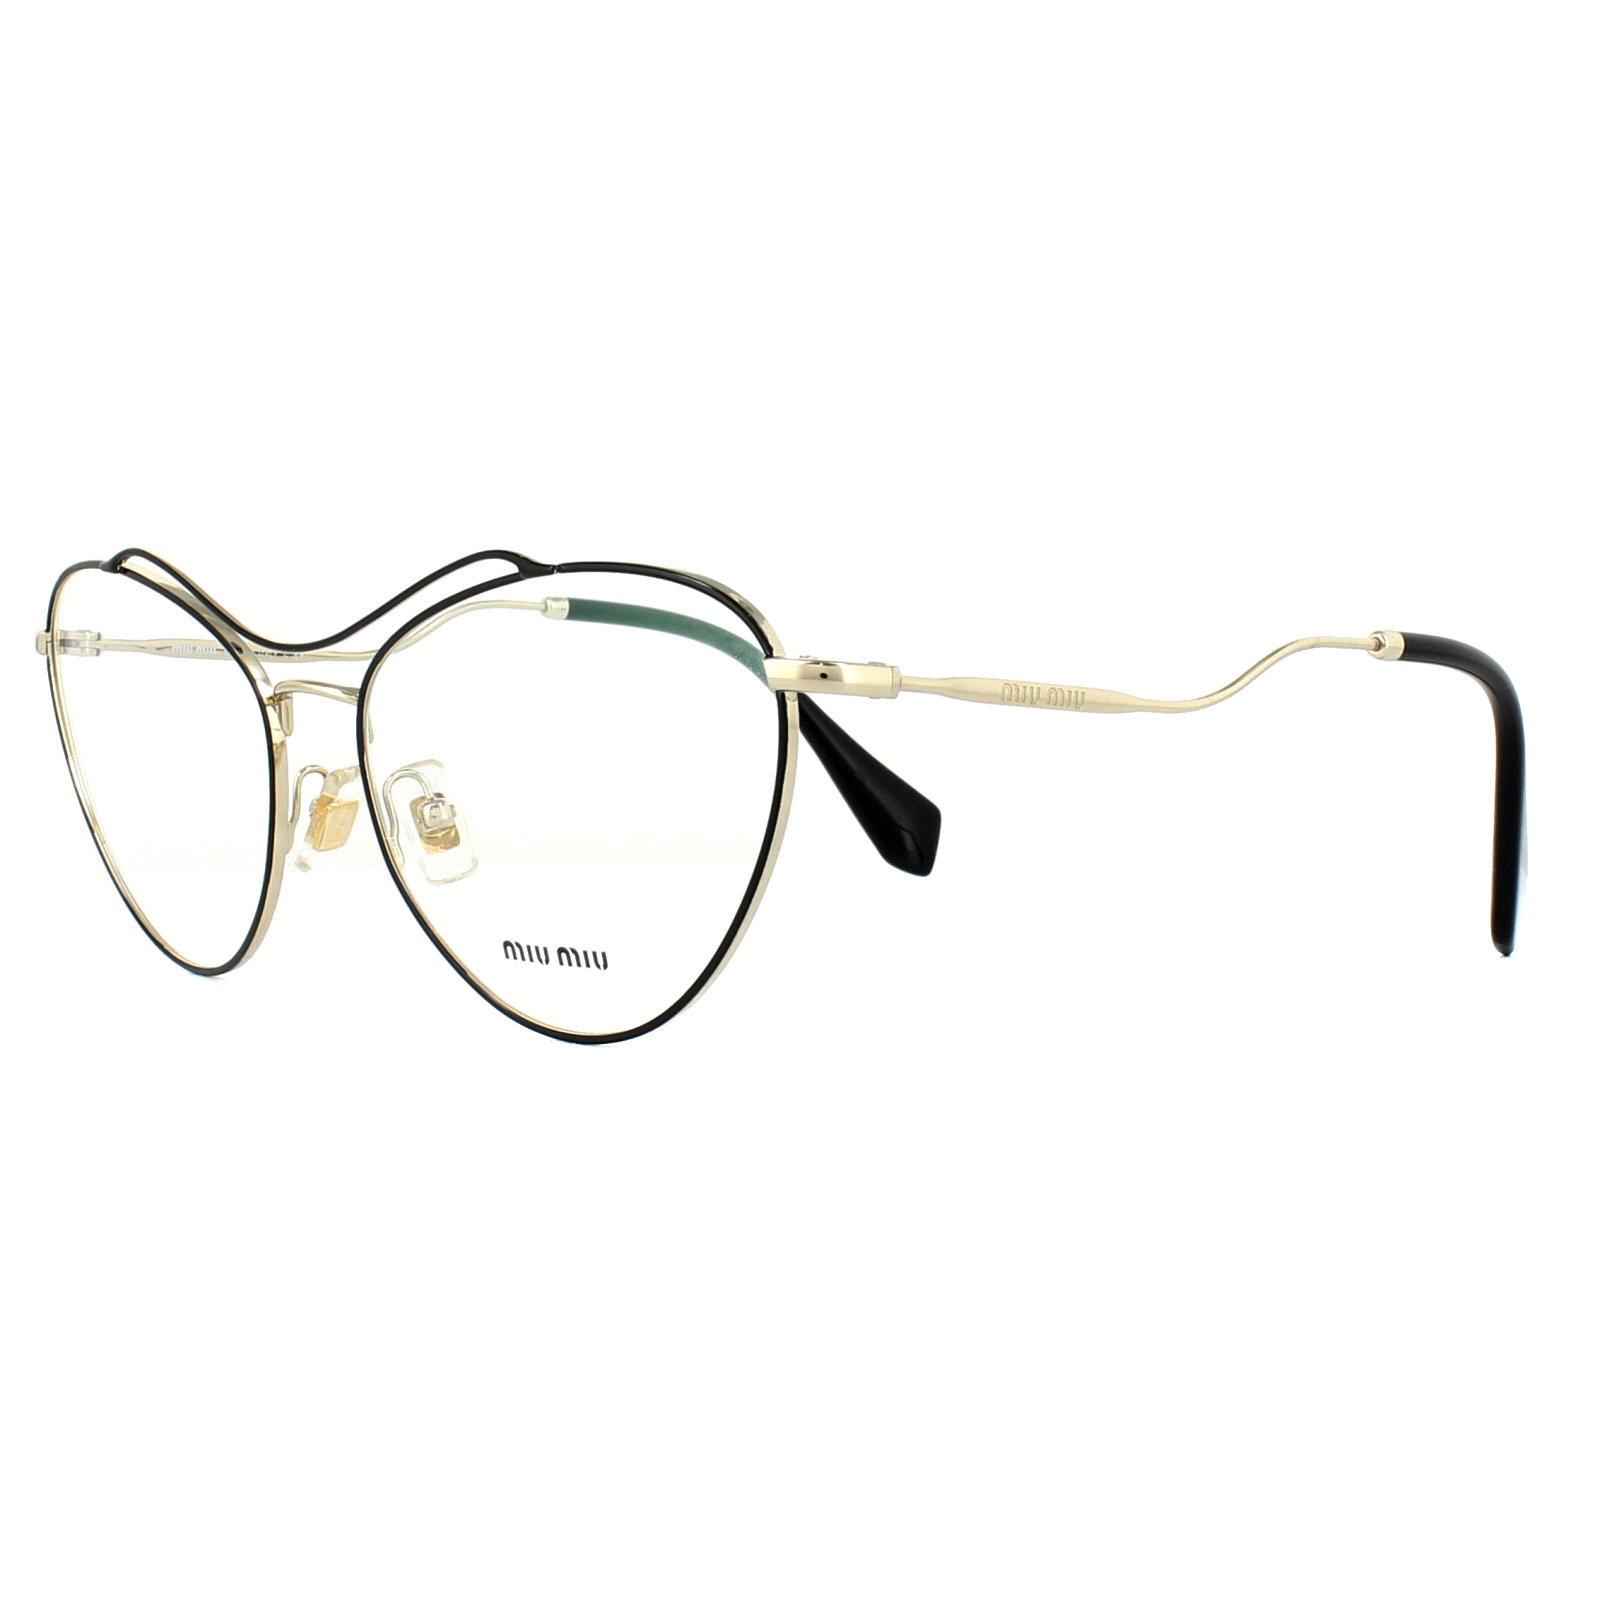 ecac9c32ac05d Sentinel Miu Miu Glasses Frames MU53PV 1AB1O1 Pale Gold Black 56mm Womens